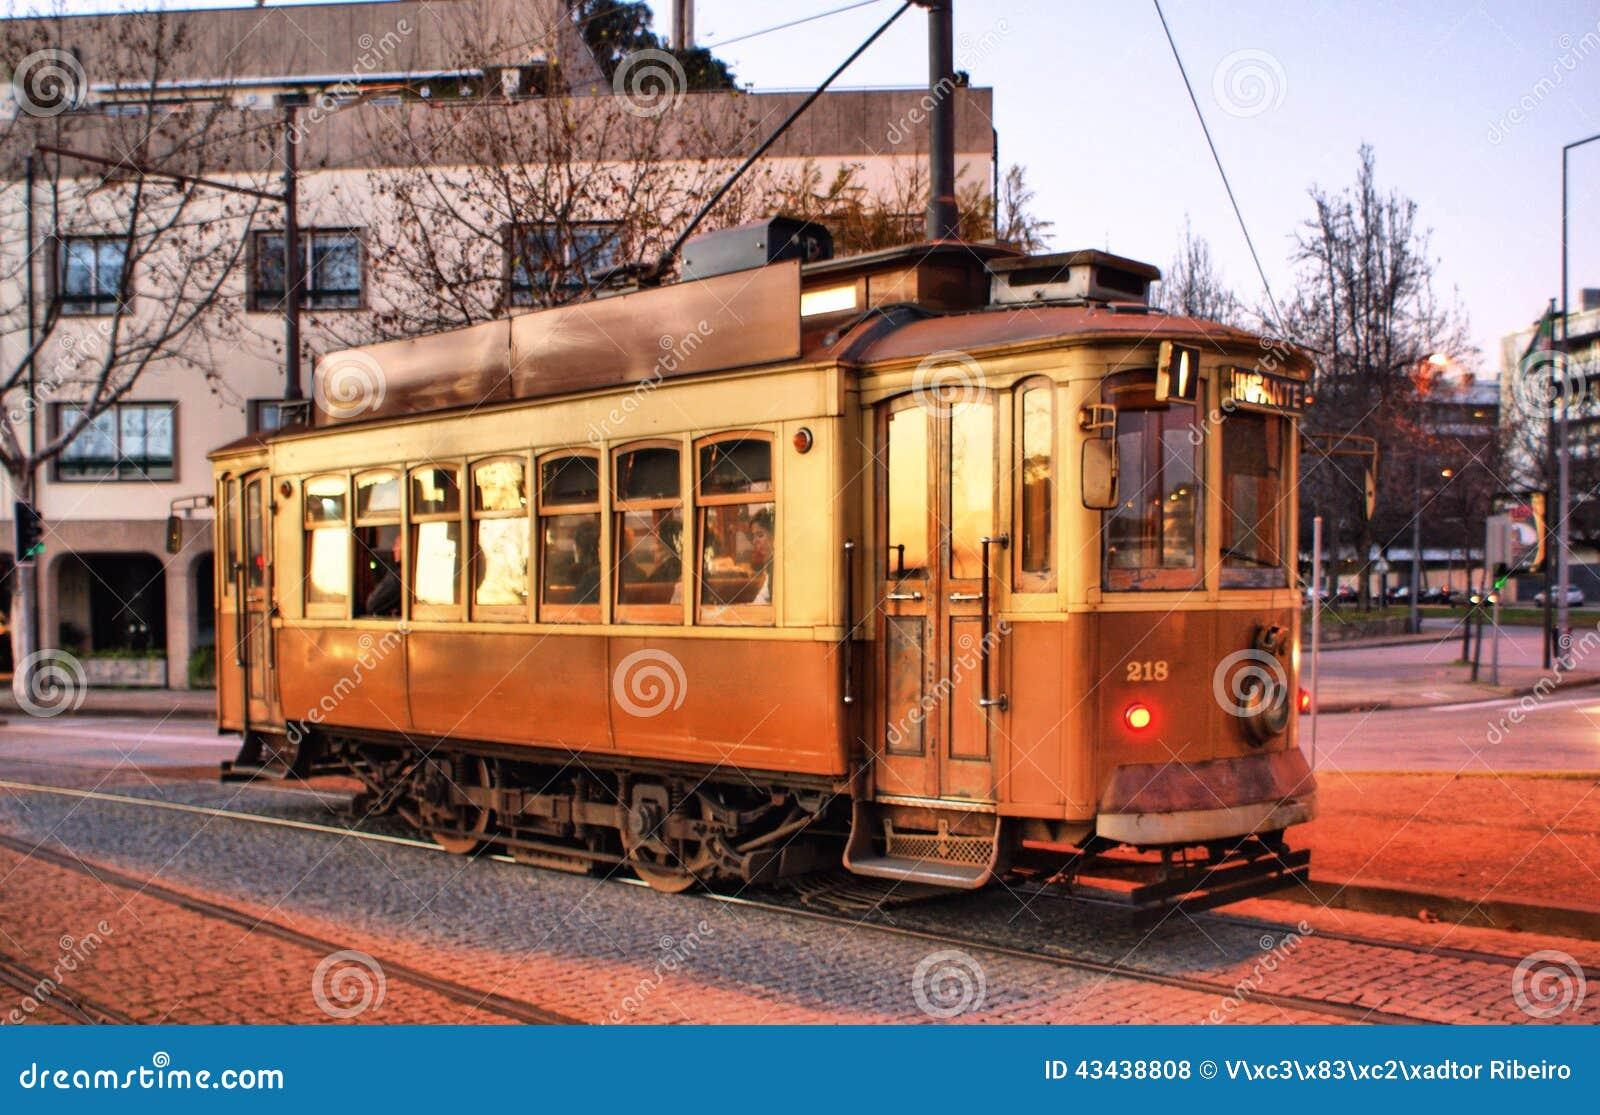 Typical tram in Porto